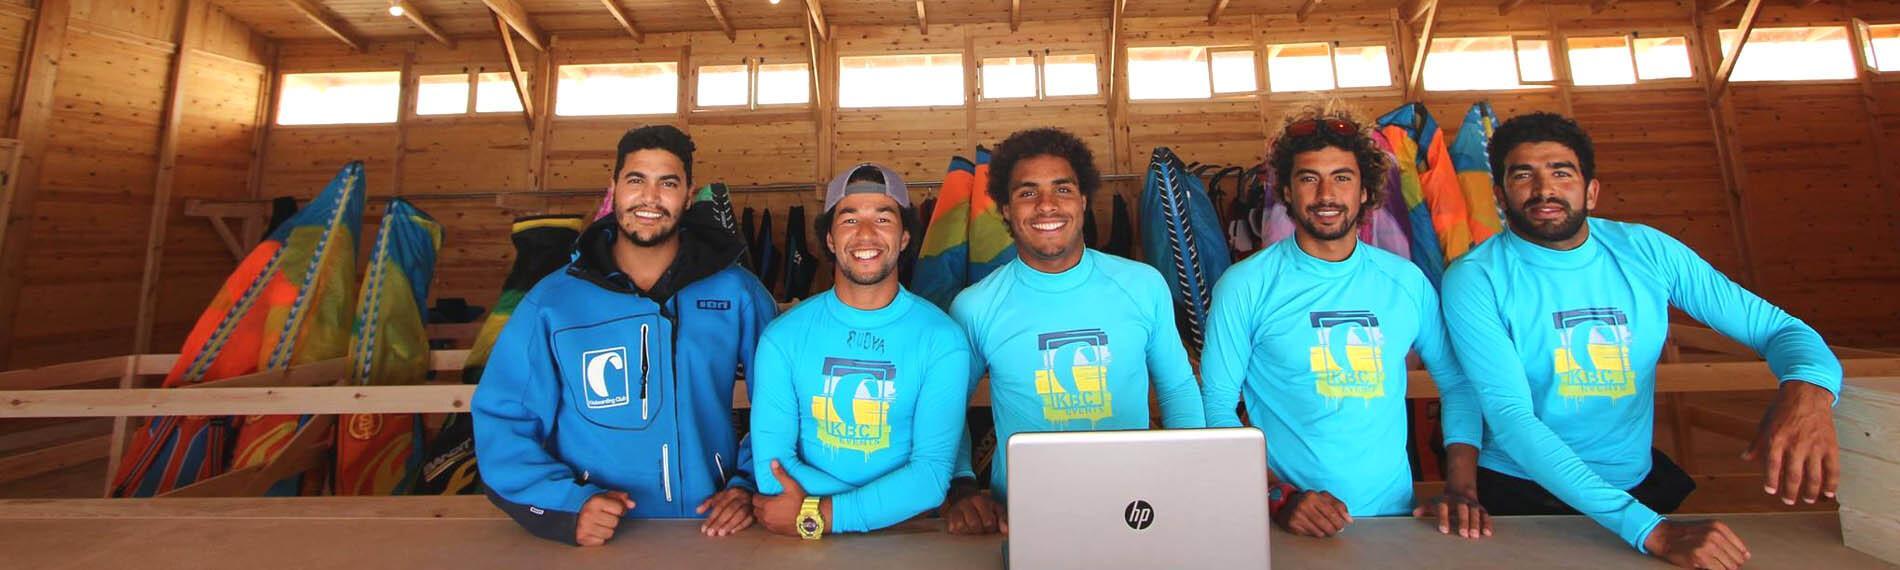 Kiteboarding Club Dakhla Team